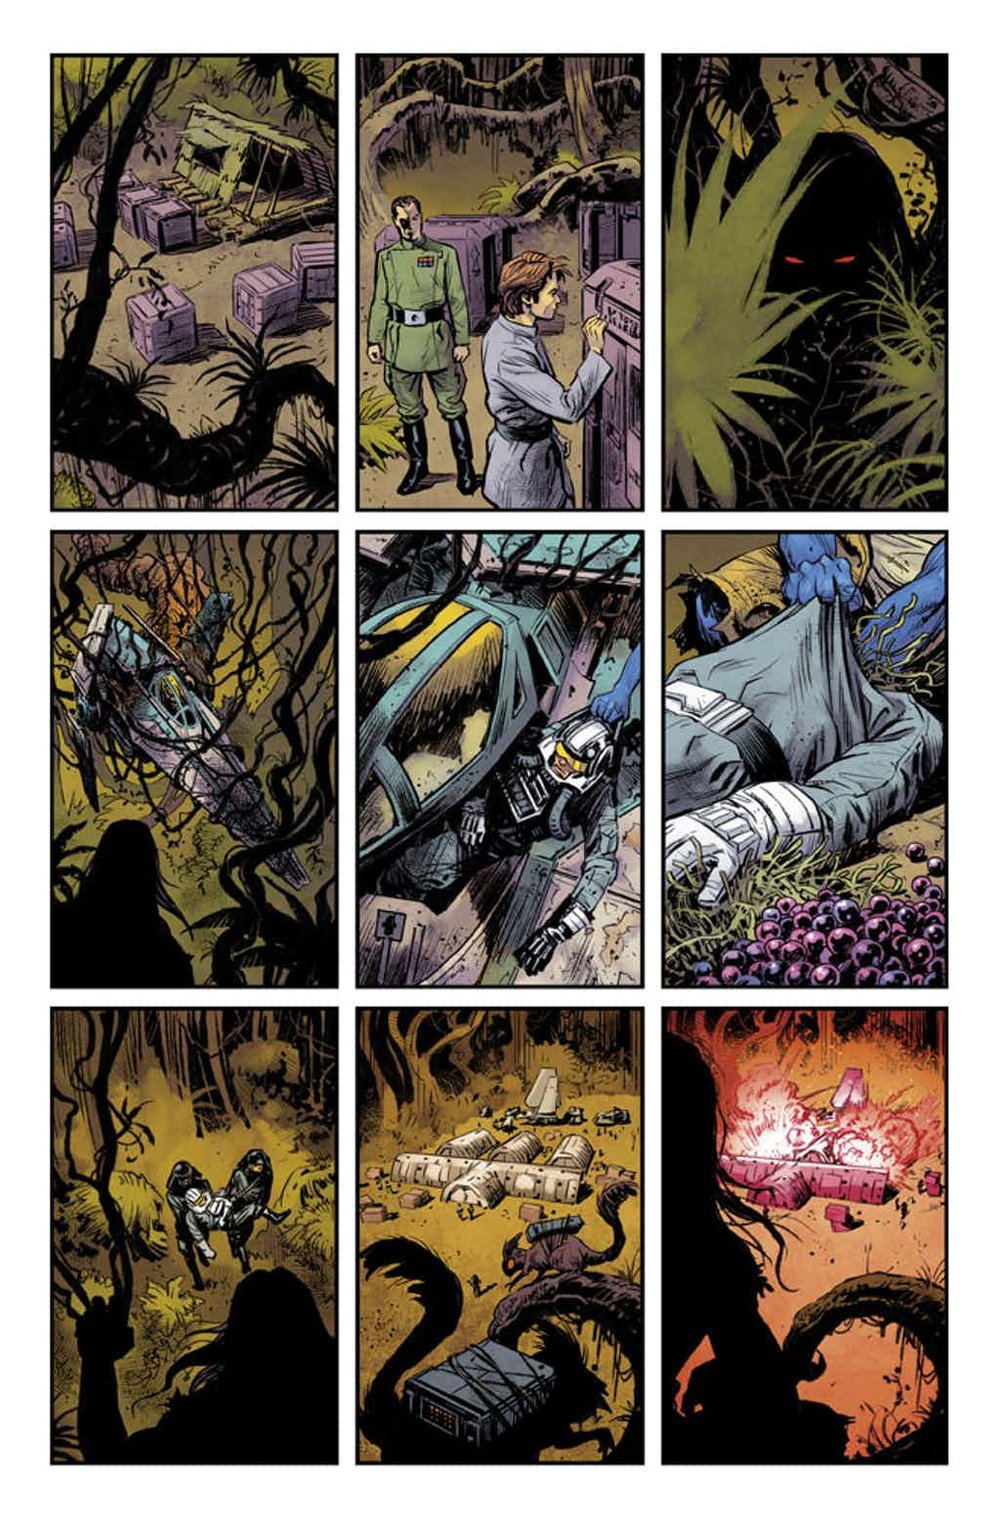 Marvel-Thrawn-Comic-Page-1.jpg